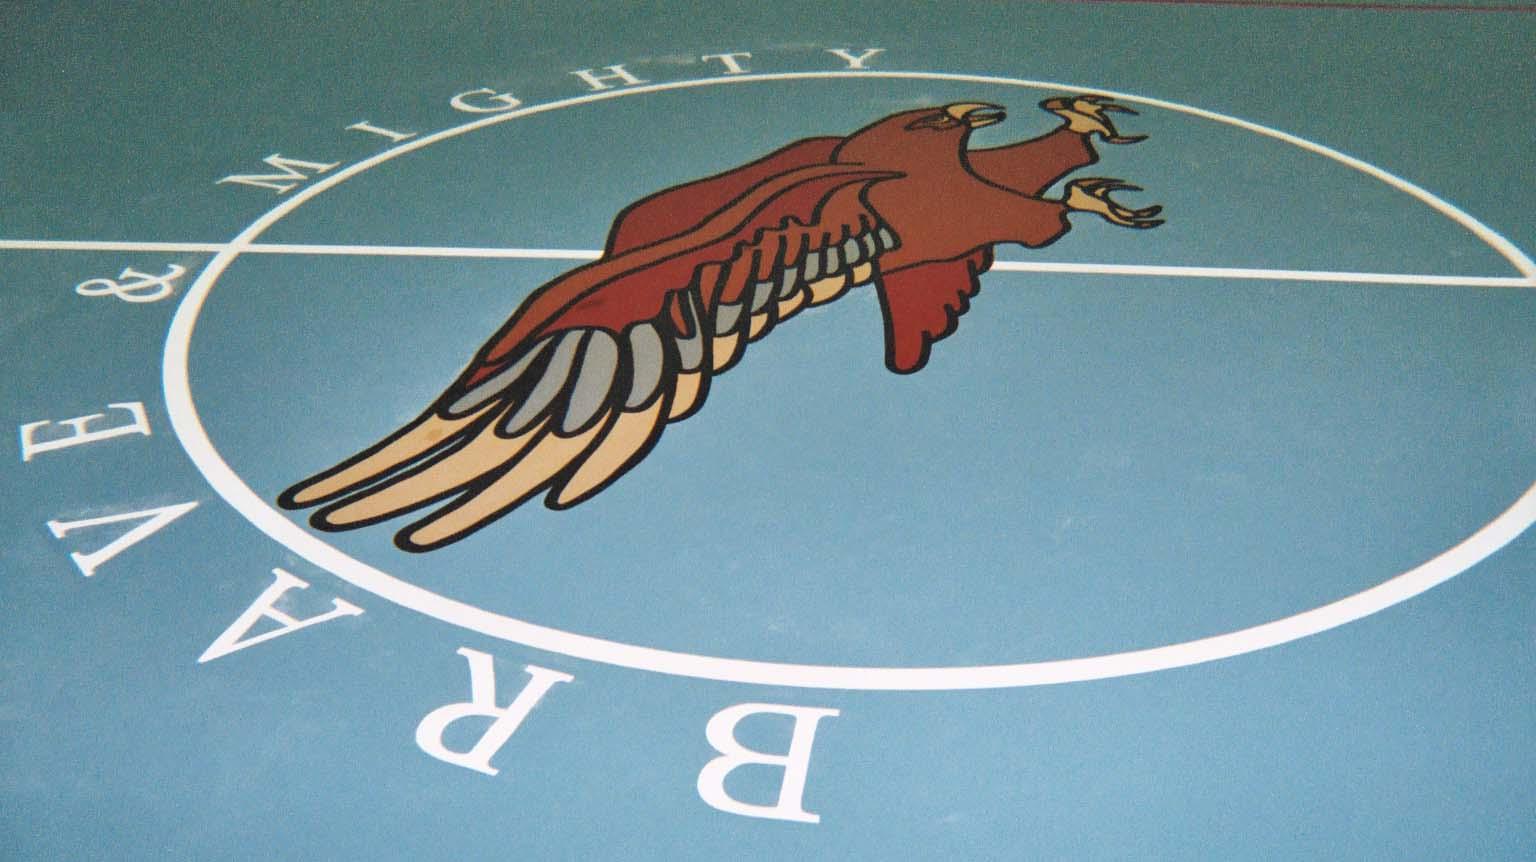 El Cerrito Middle School gym epoxy floor hand painted graphics